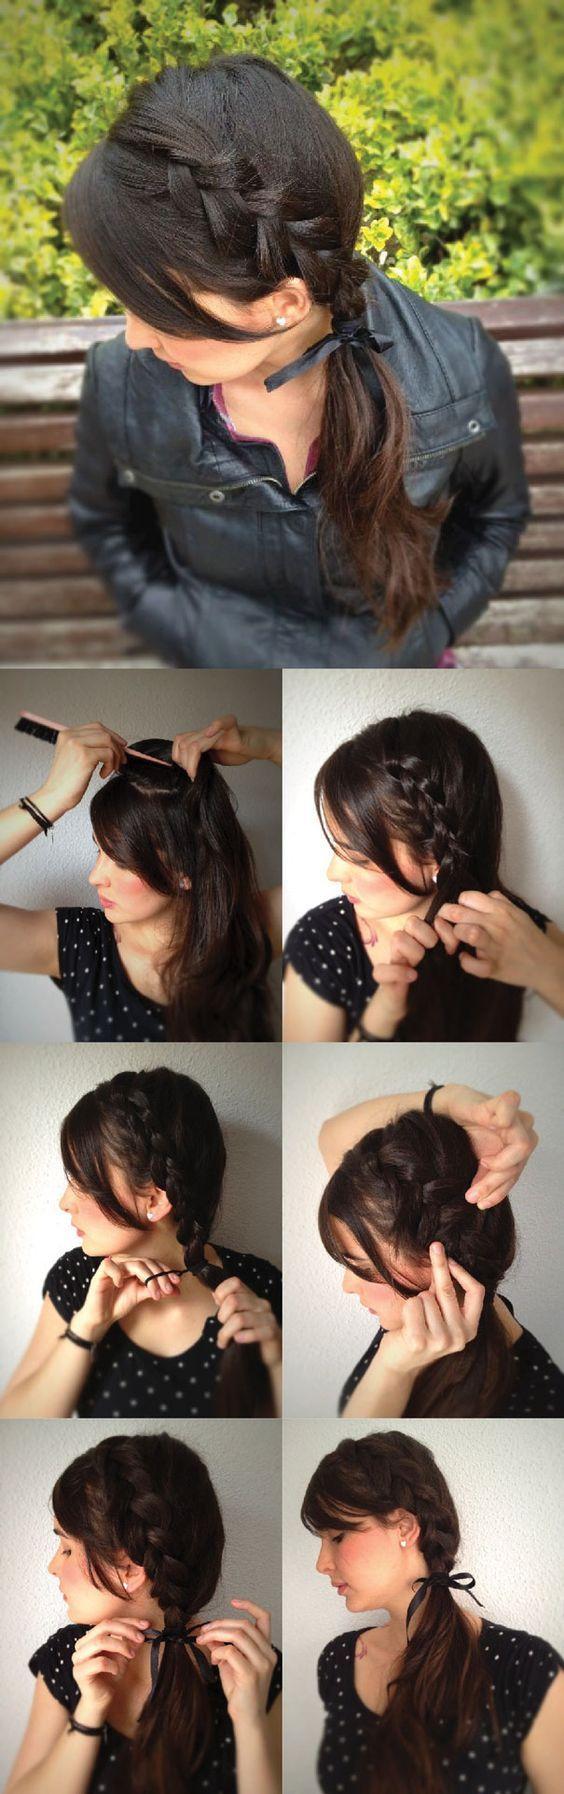 Join the Mood: hair...